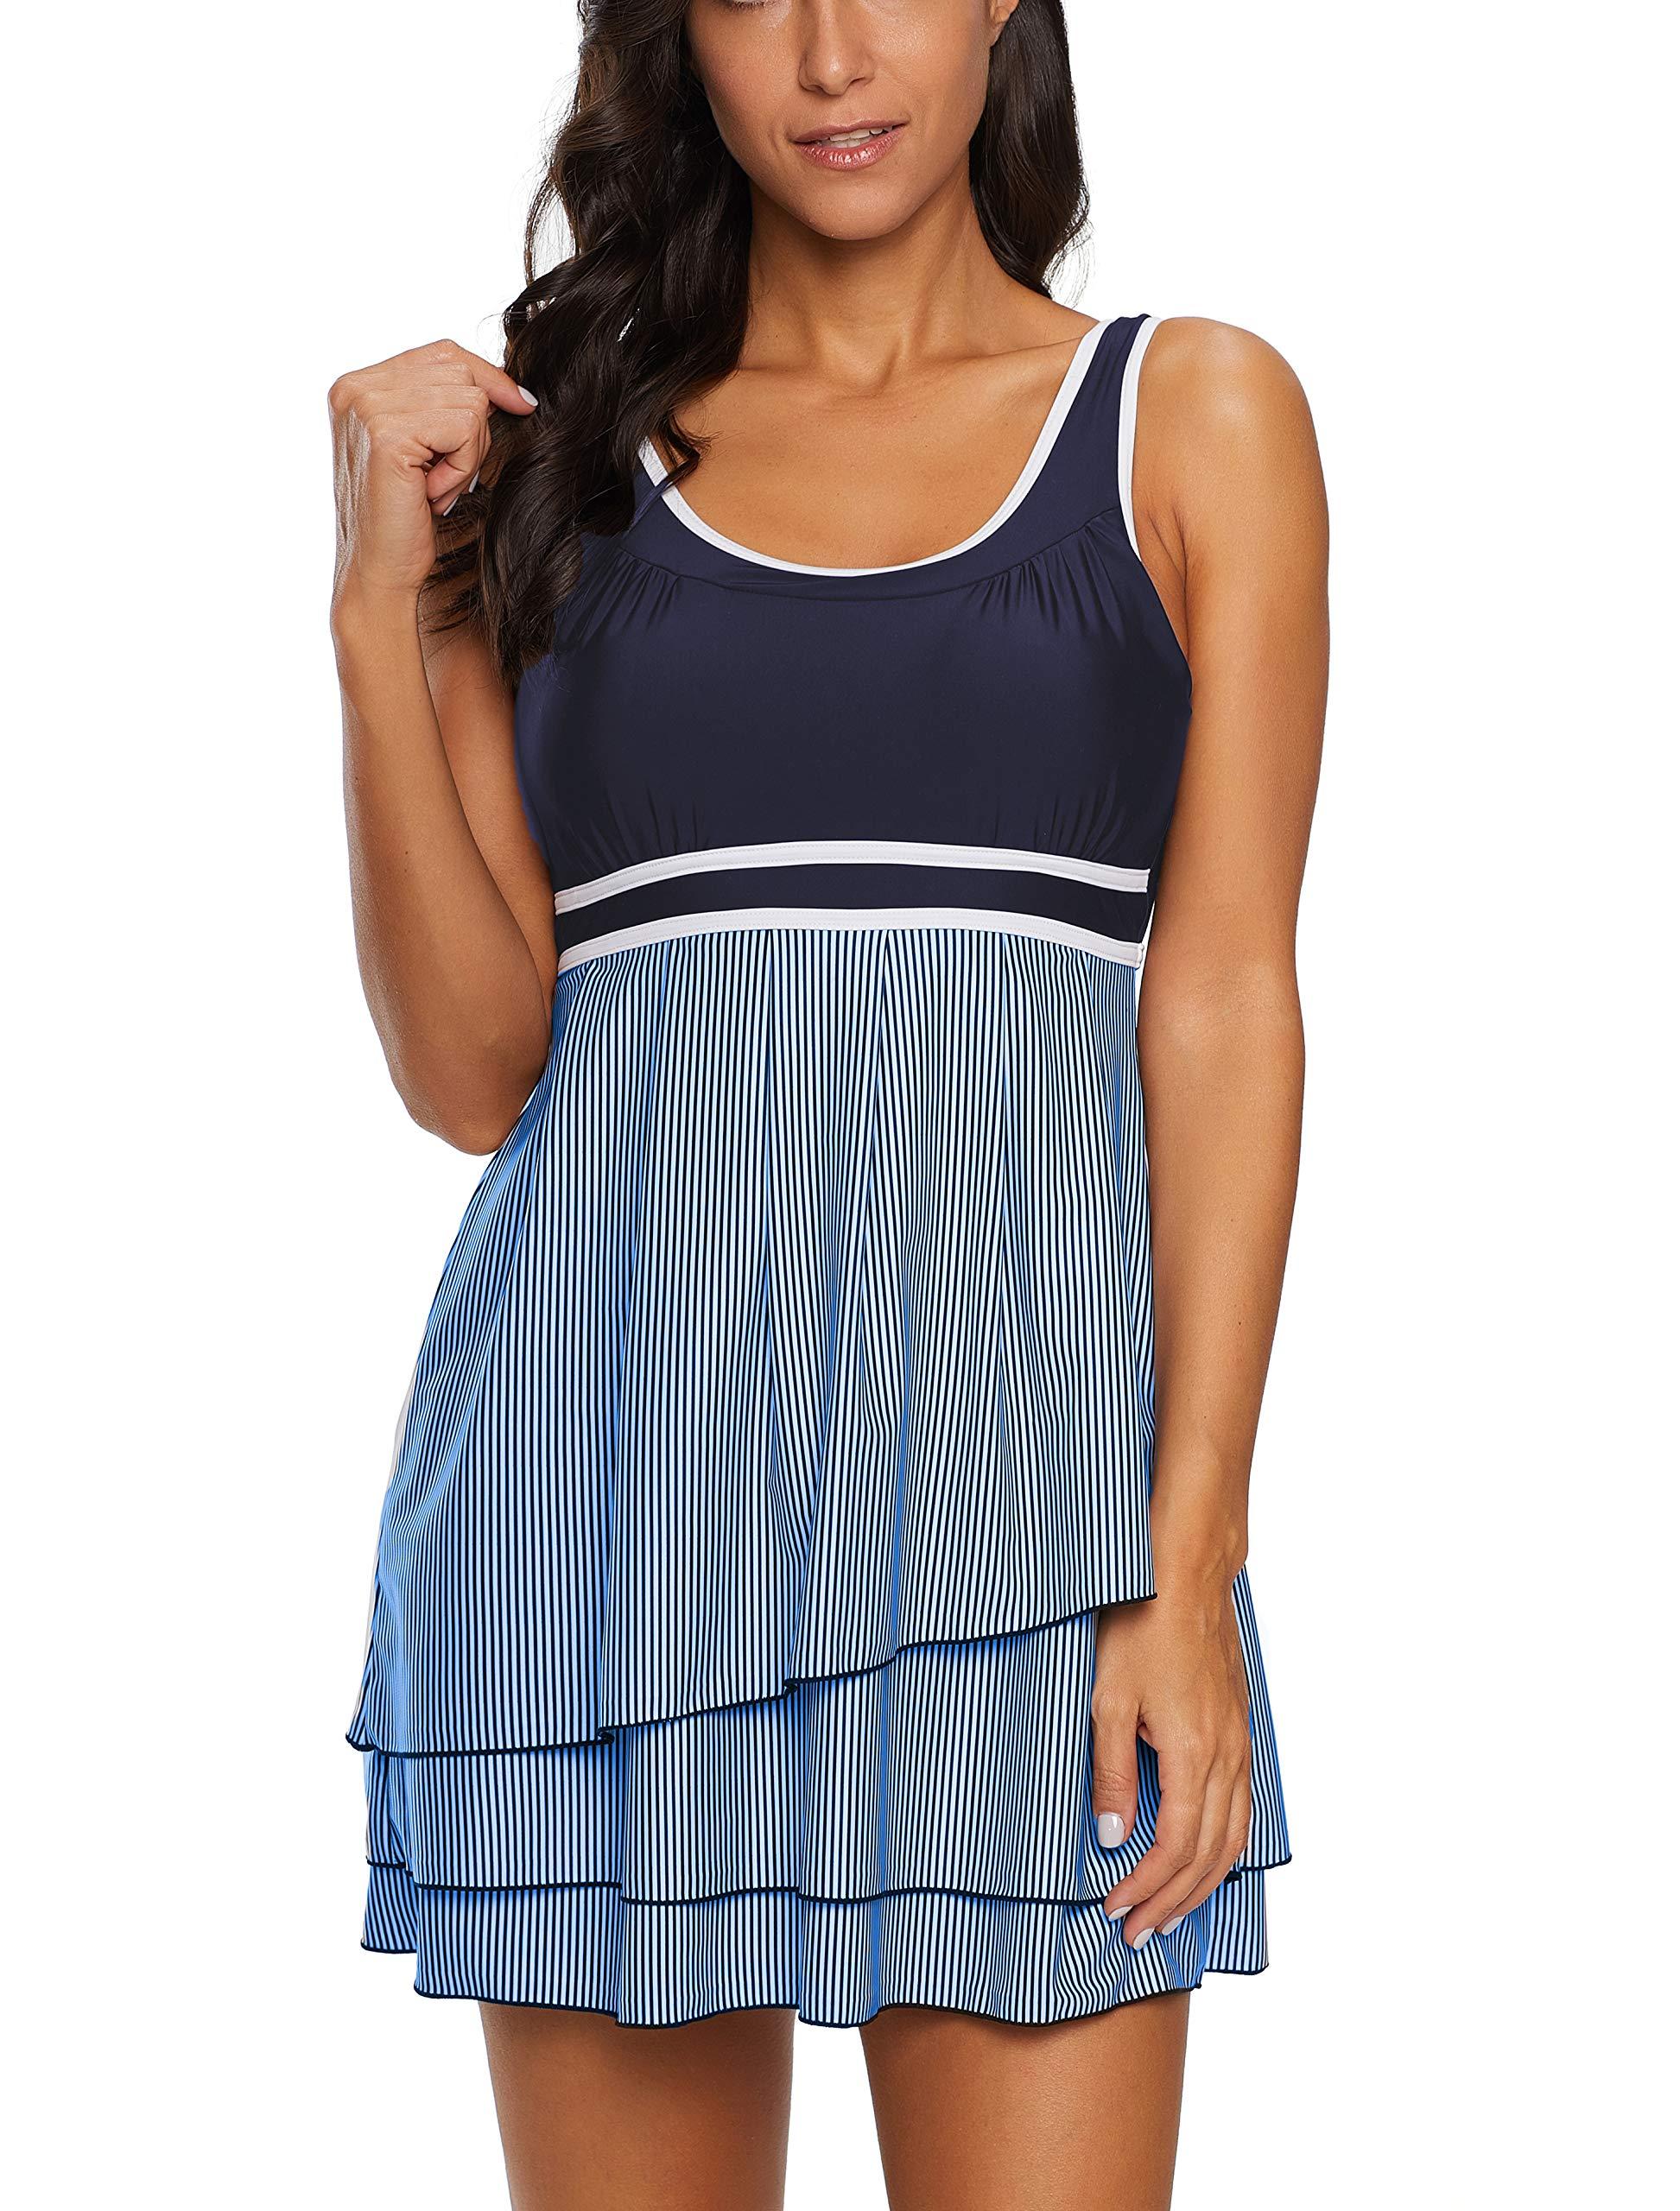 YAMENUSA Women's Slimming Swimdress Cover Up Tummy Control Swimsuits for Women Retro Swimwear Bathing Suit Blue/2pc Medium(US:8-10)